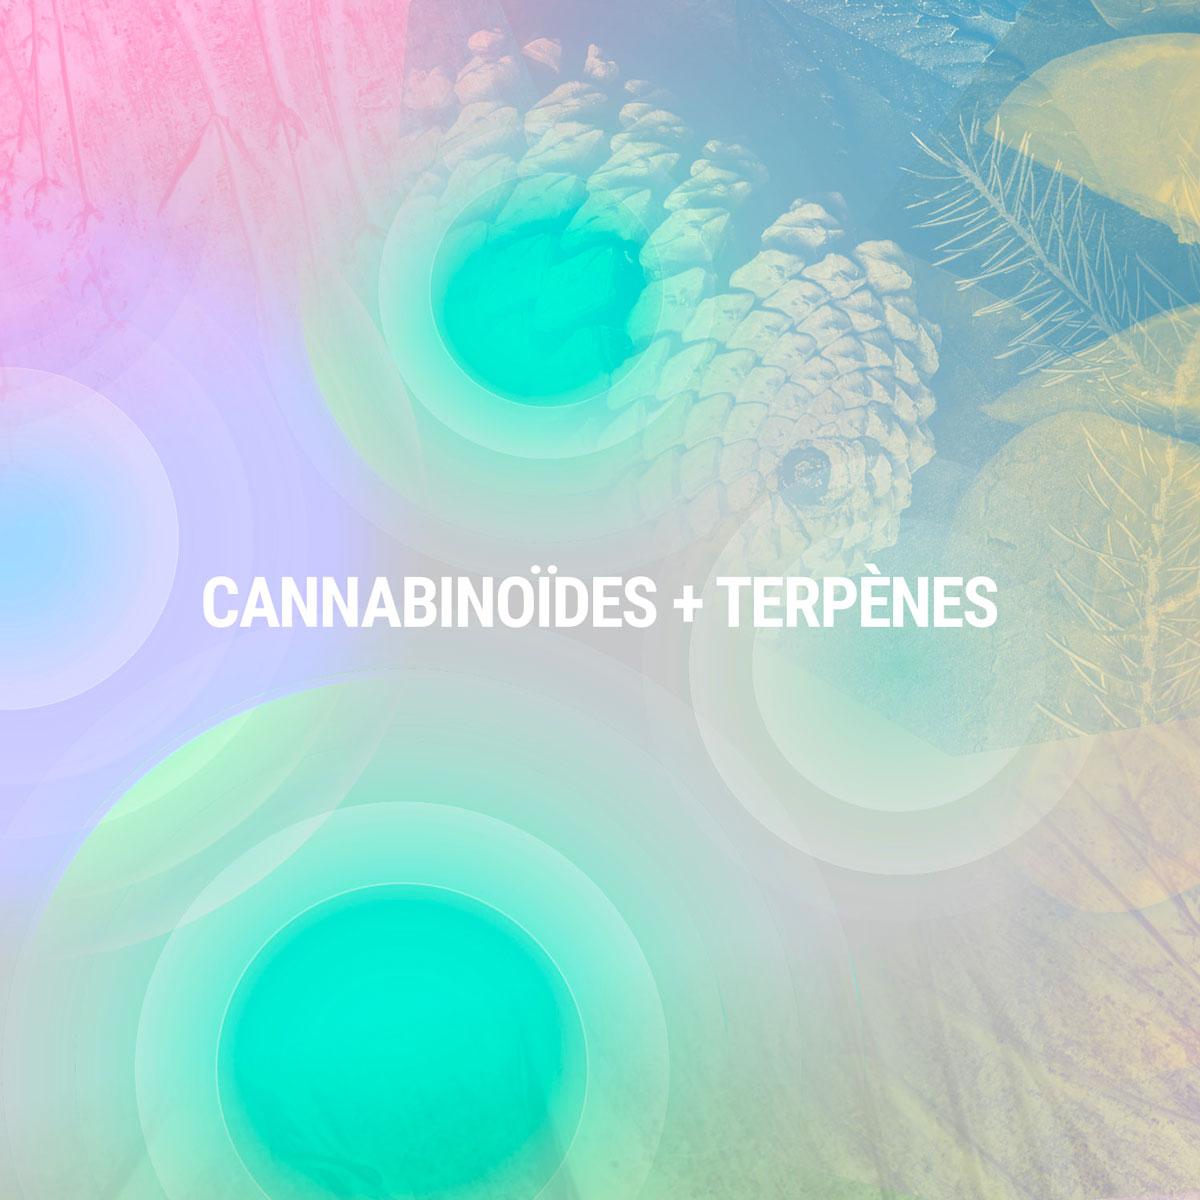 Cannabinoïdes + Terpènes